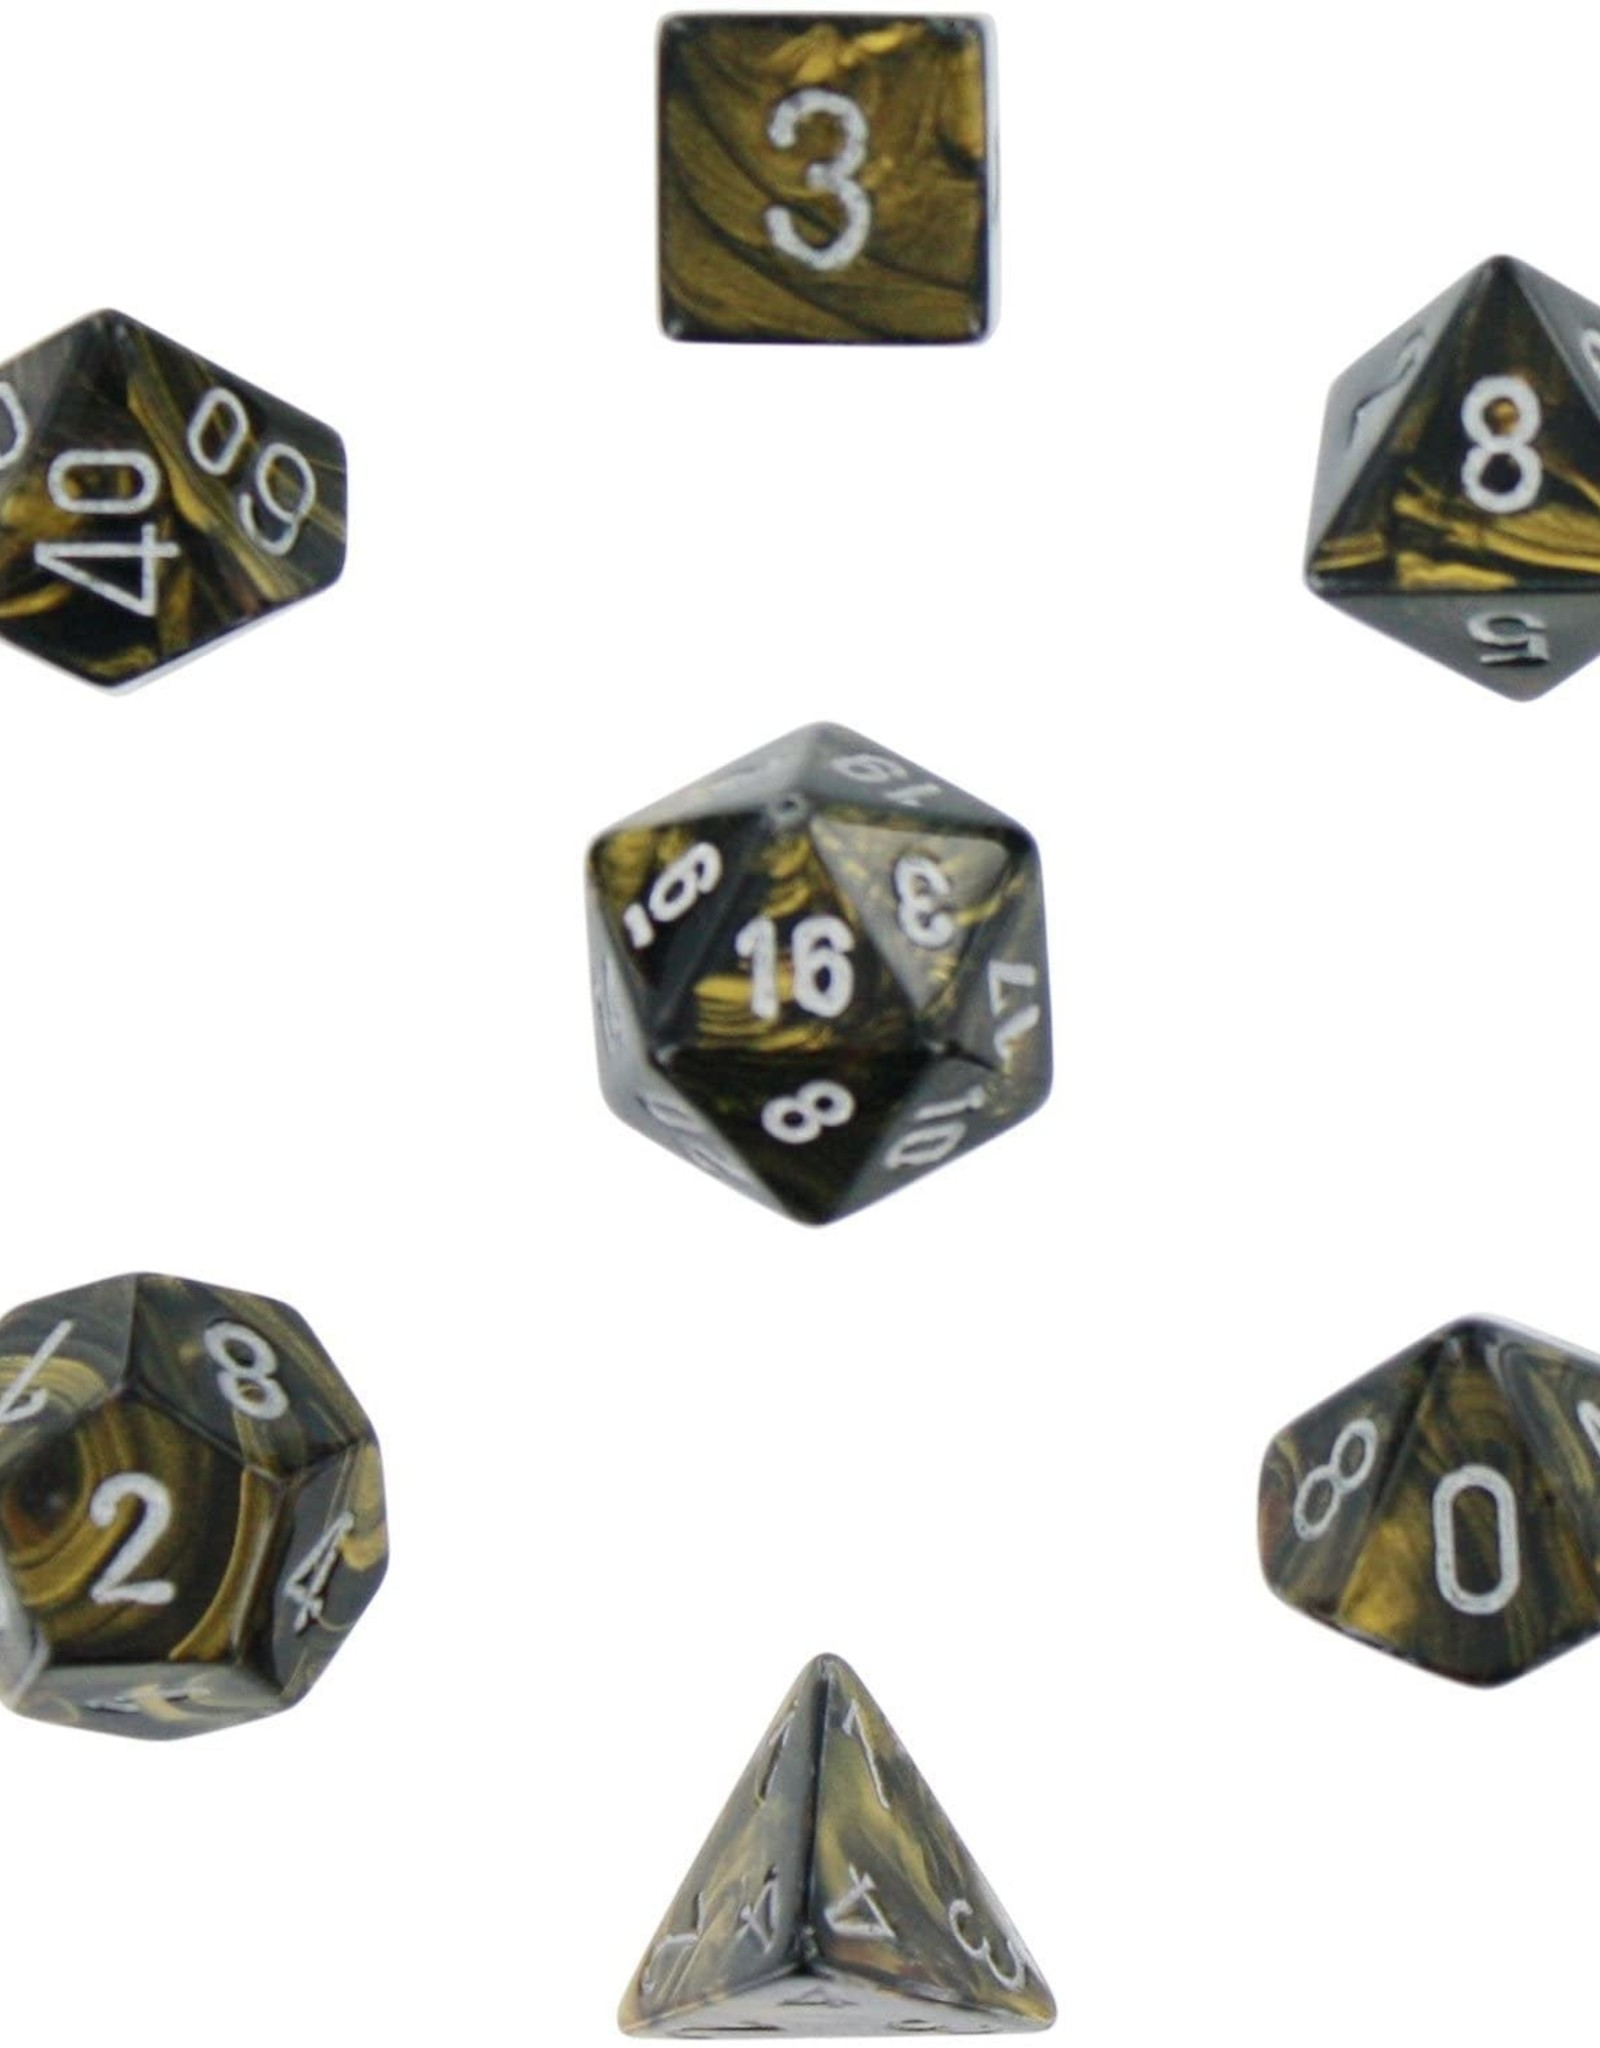 Chessex Leaf Poly 7 set: Black & Gold w/ Silver